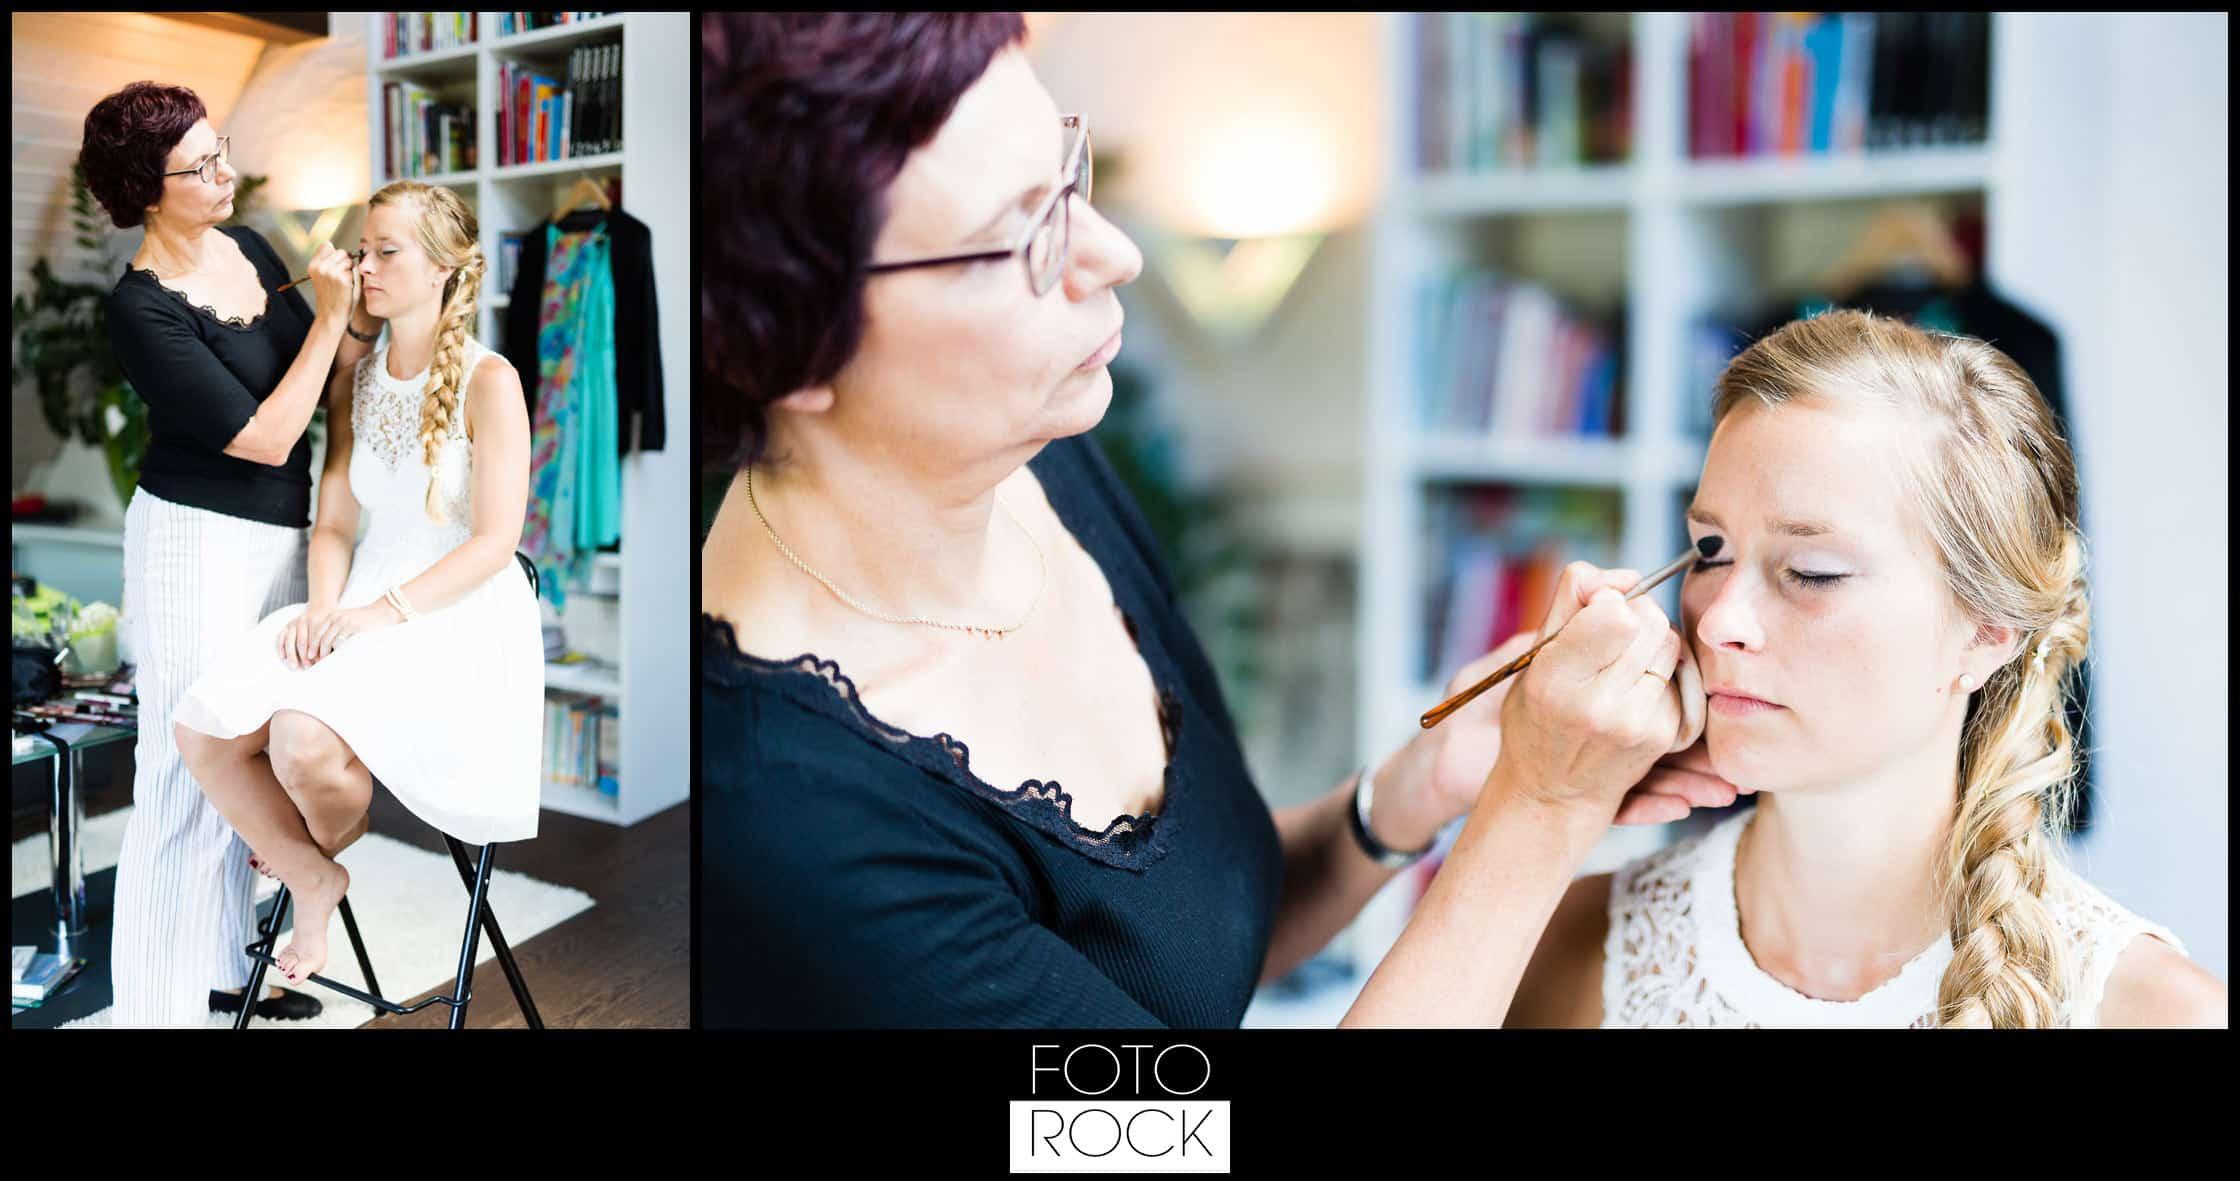 Hochzeit Elzach getting ready schminke makeup drogerie fischer